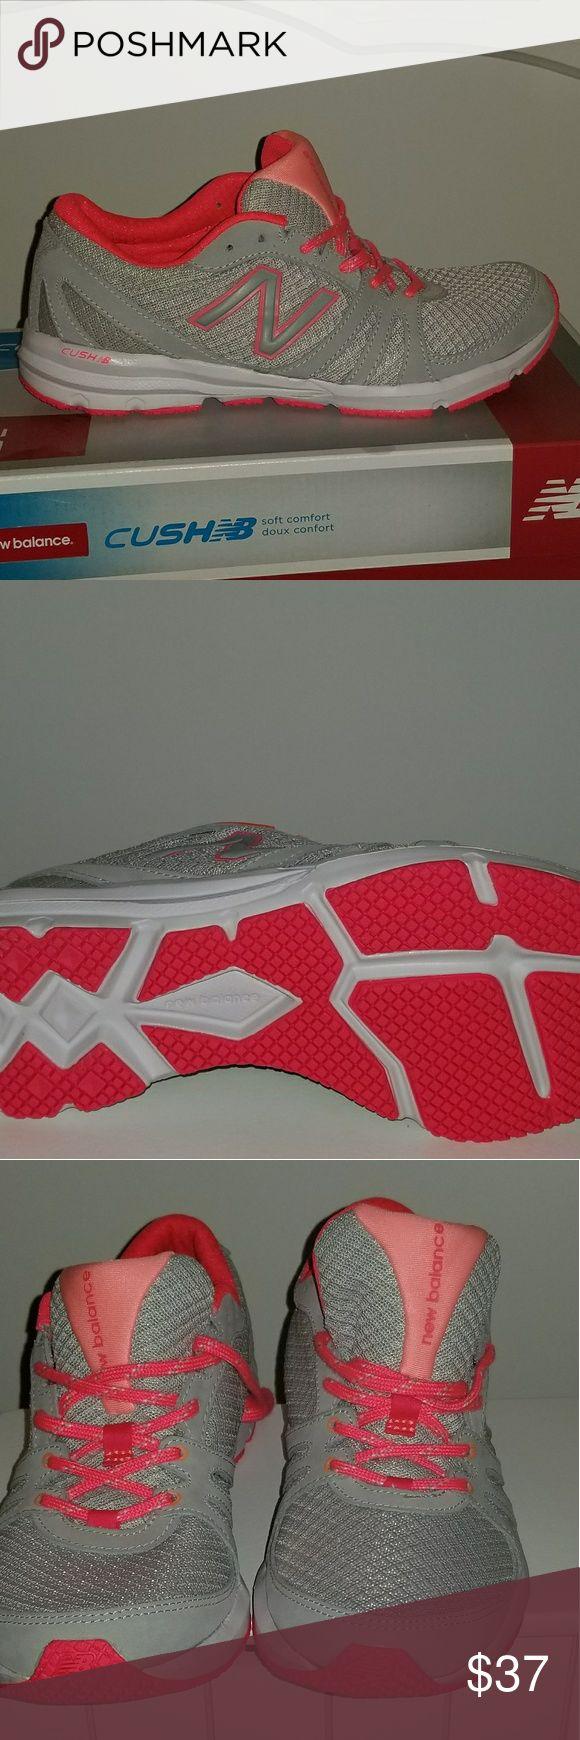 NWOT--New Balance Cush - Ladies Shoe. Size 8.5 NWOT--New Balance Cush - Ladies Training  Shoe. Size 8.5 New Balance Shoes Sneakers